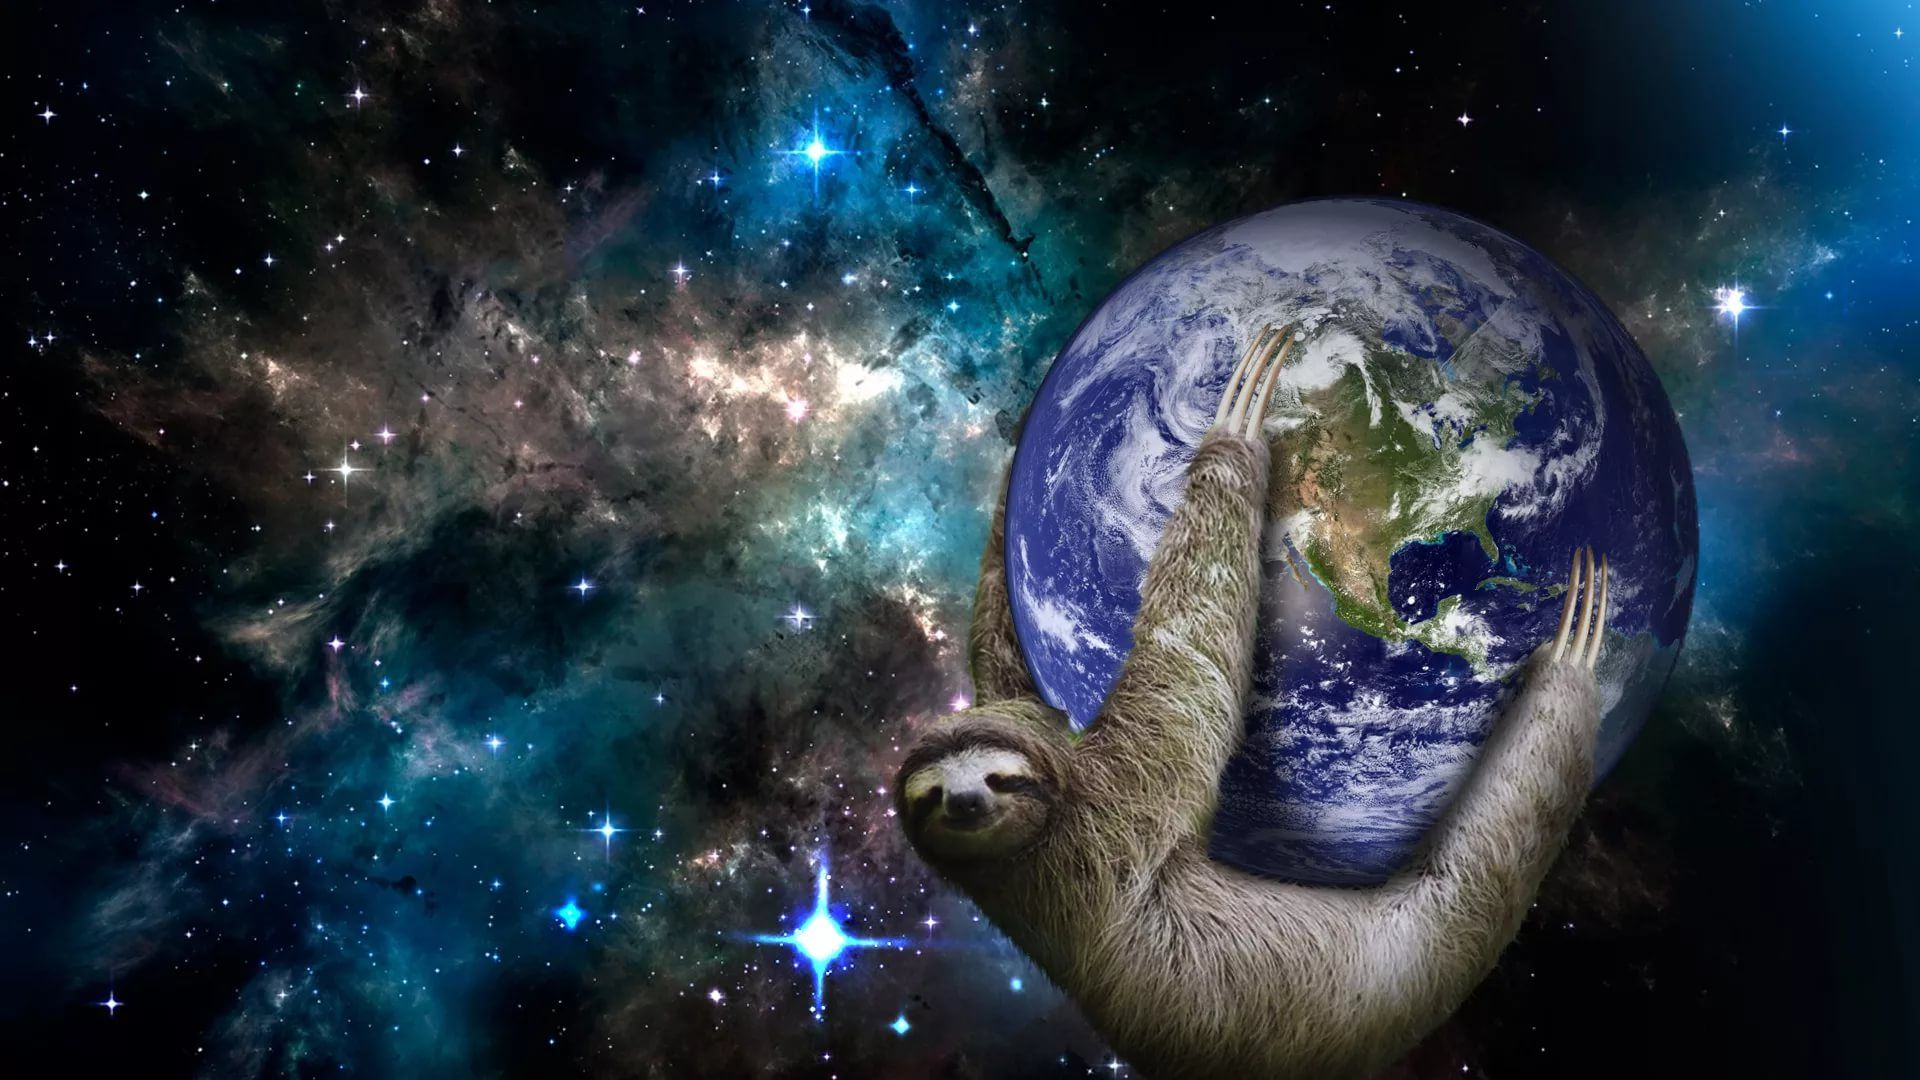 Sloth wallpaper photo full hd